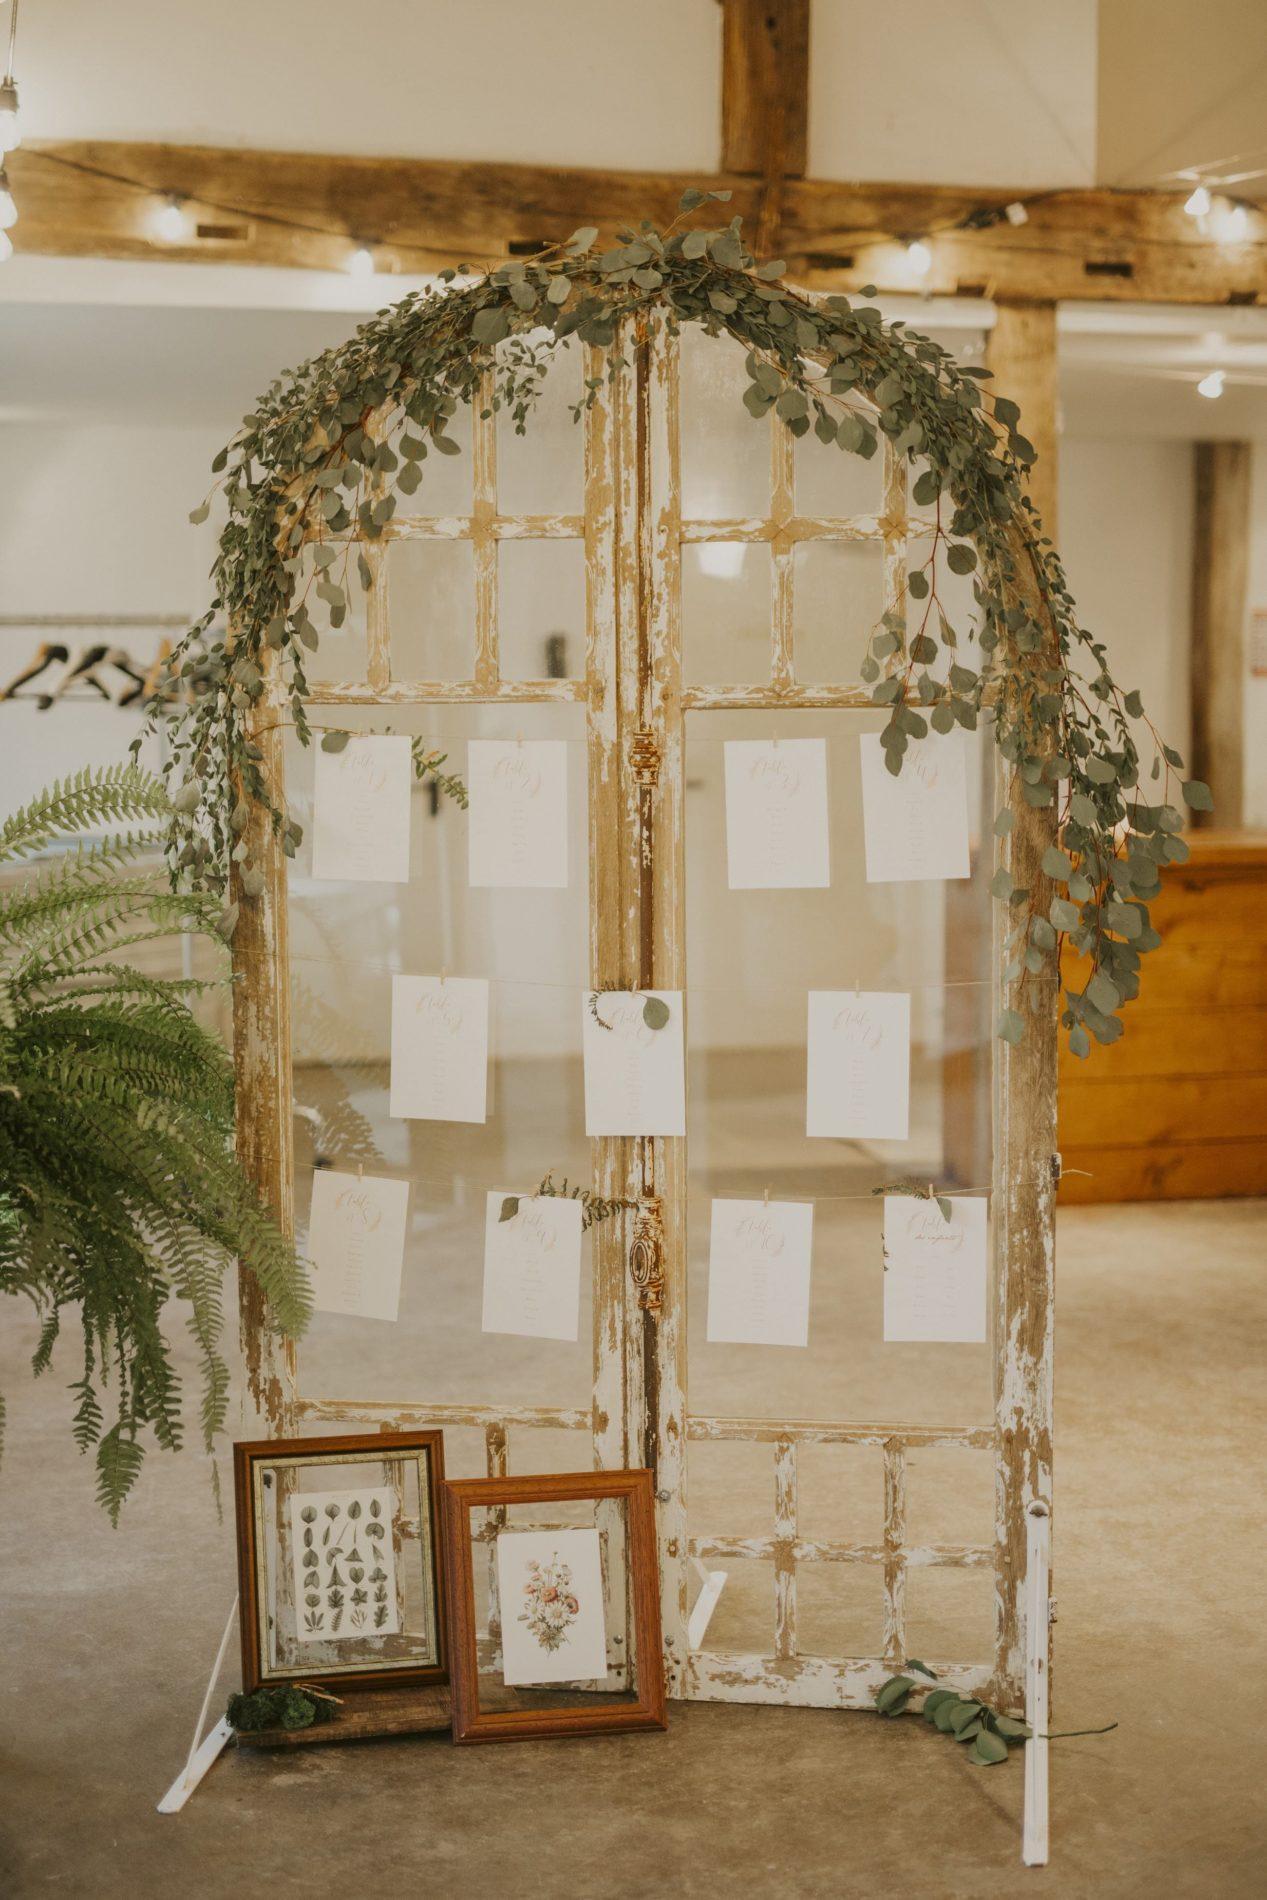 0153_04-CelineSereivuth-155-obonheurdesdames-decoration-mariage-location-Jordane-Chaillou